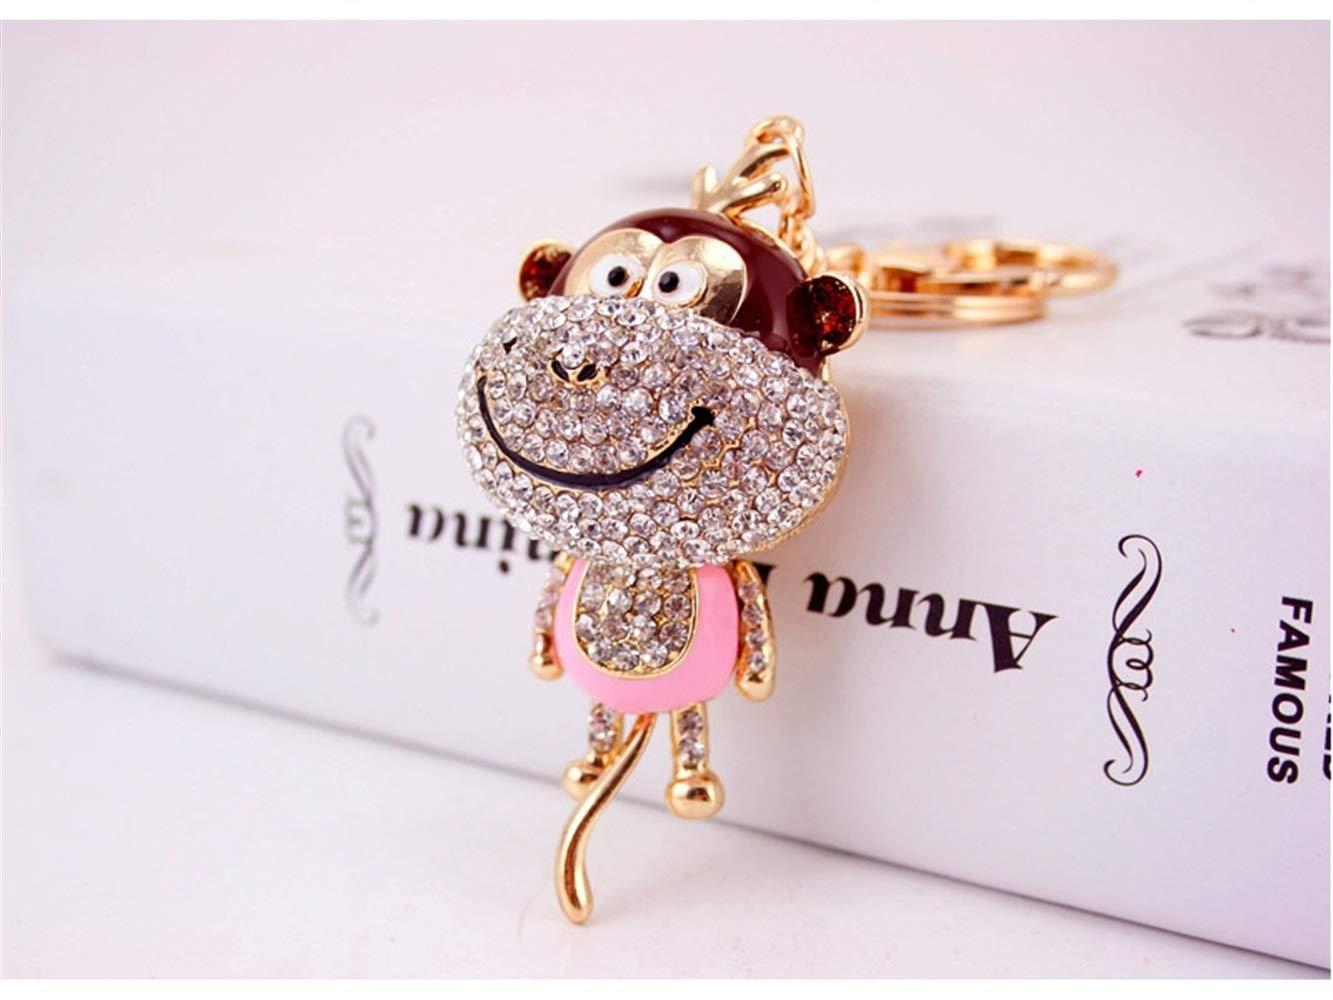 Car Keychain, Cute Diamond Long Tail Monkey Keychain Animal Shape Key Trinket Car Bag Key Holder Decorations(Pink) for Gift